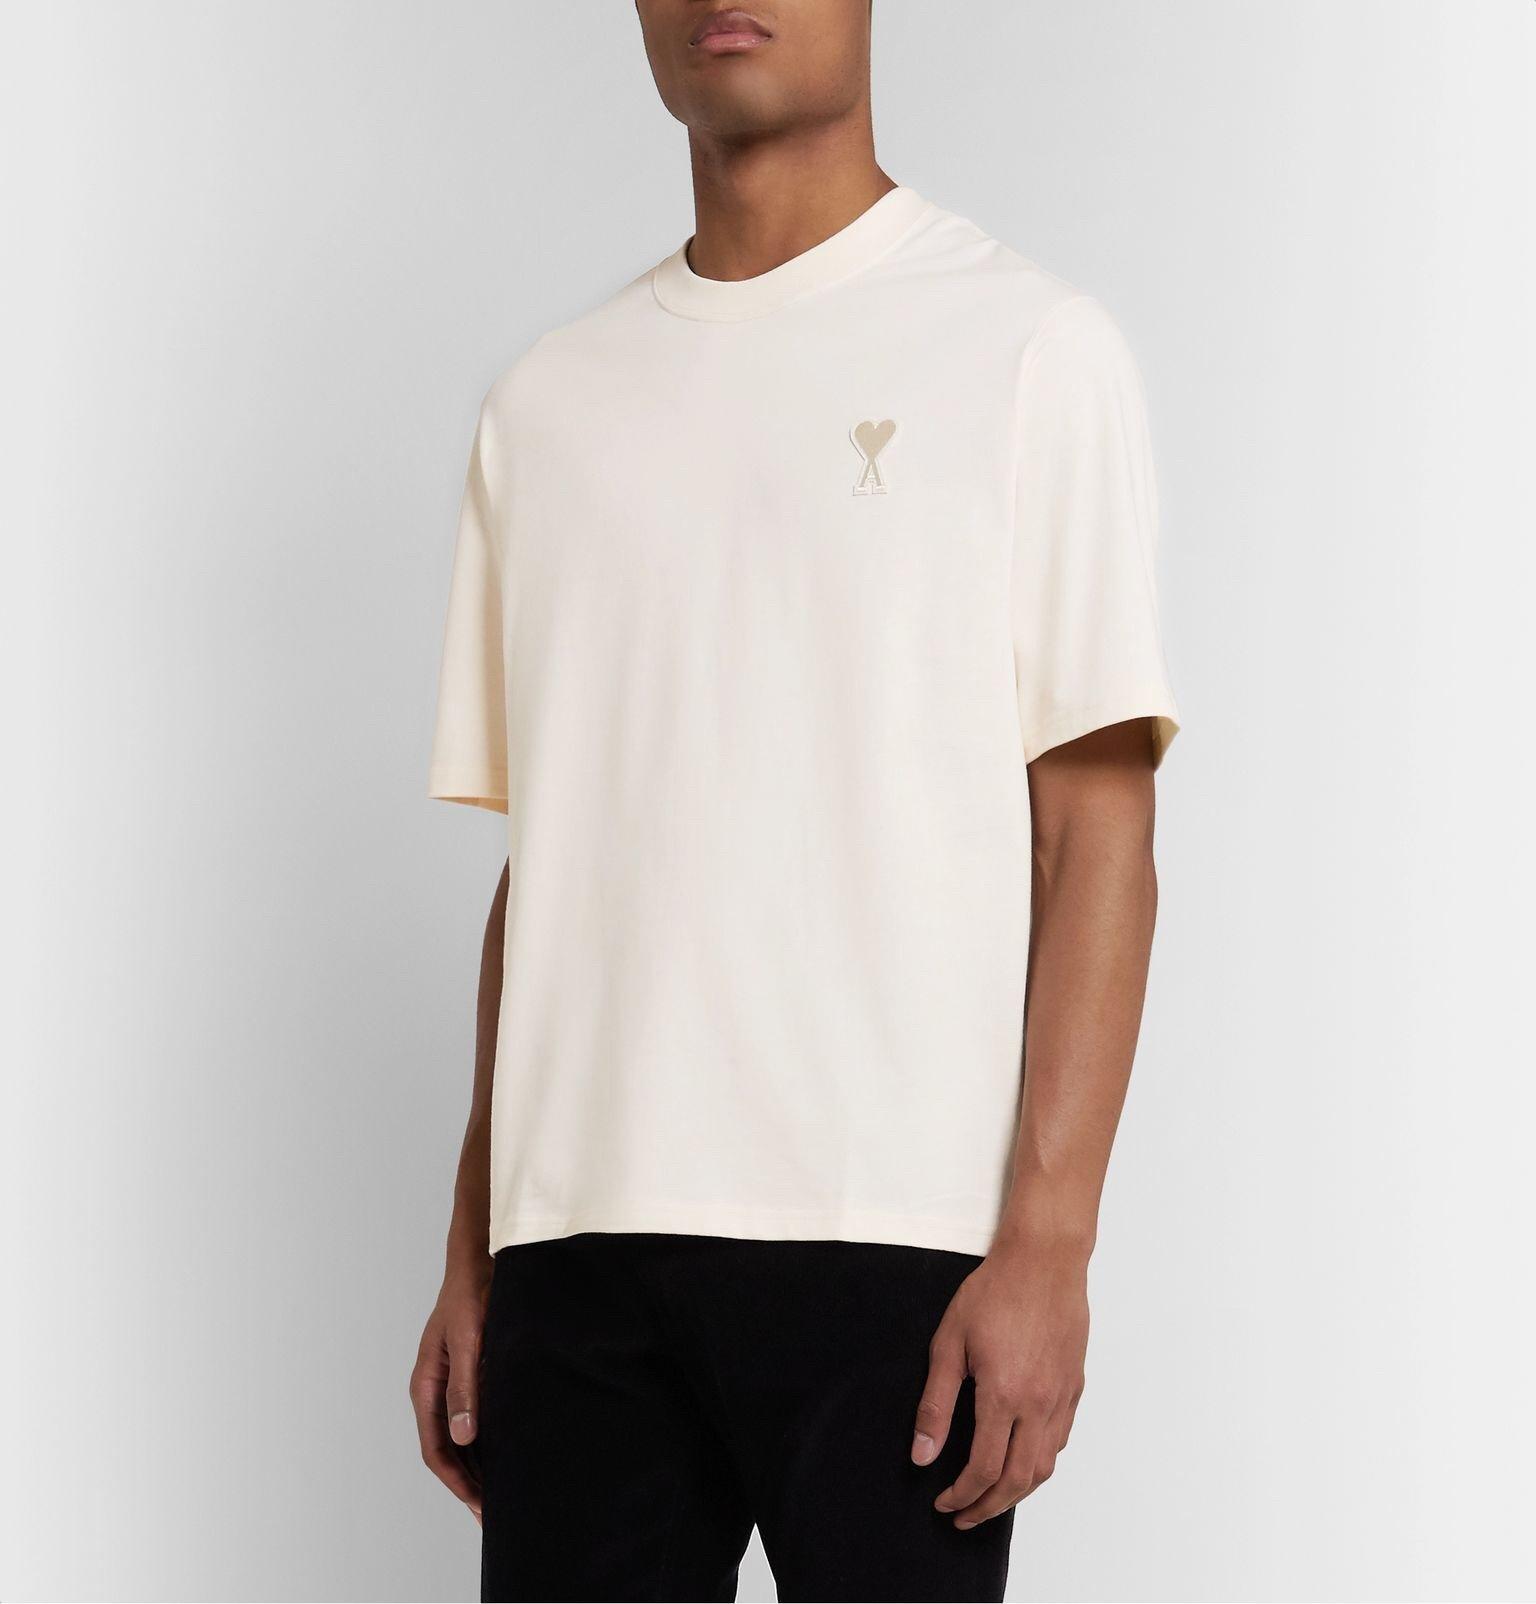 AMI Alexandre Mattiussi T Shirt 1:1 Real Tag 20ss Men Women Summer Style Top Version Small Logo Top Tees Mens AMI T-shirts